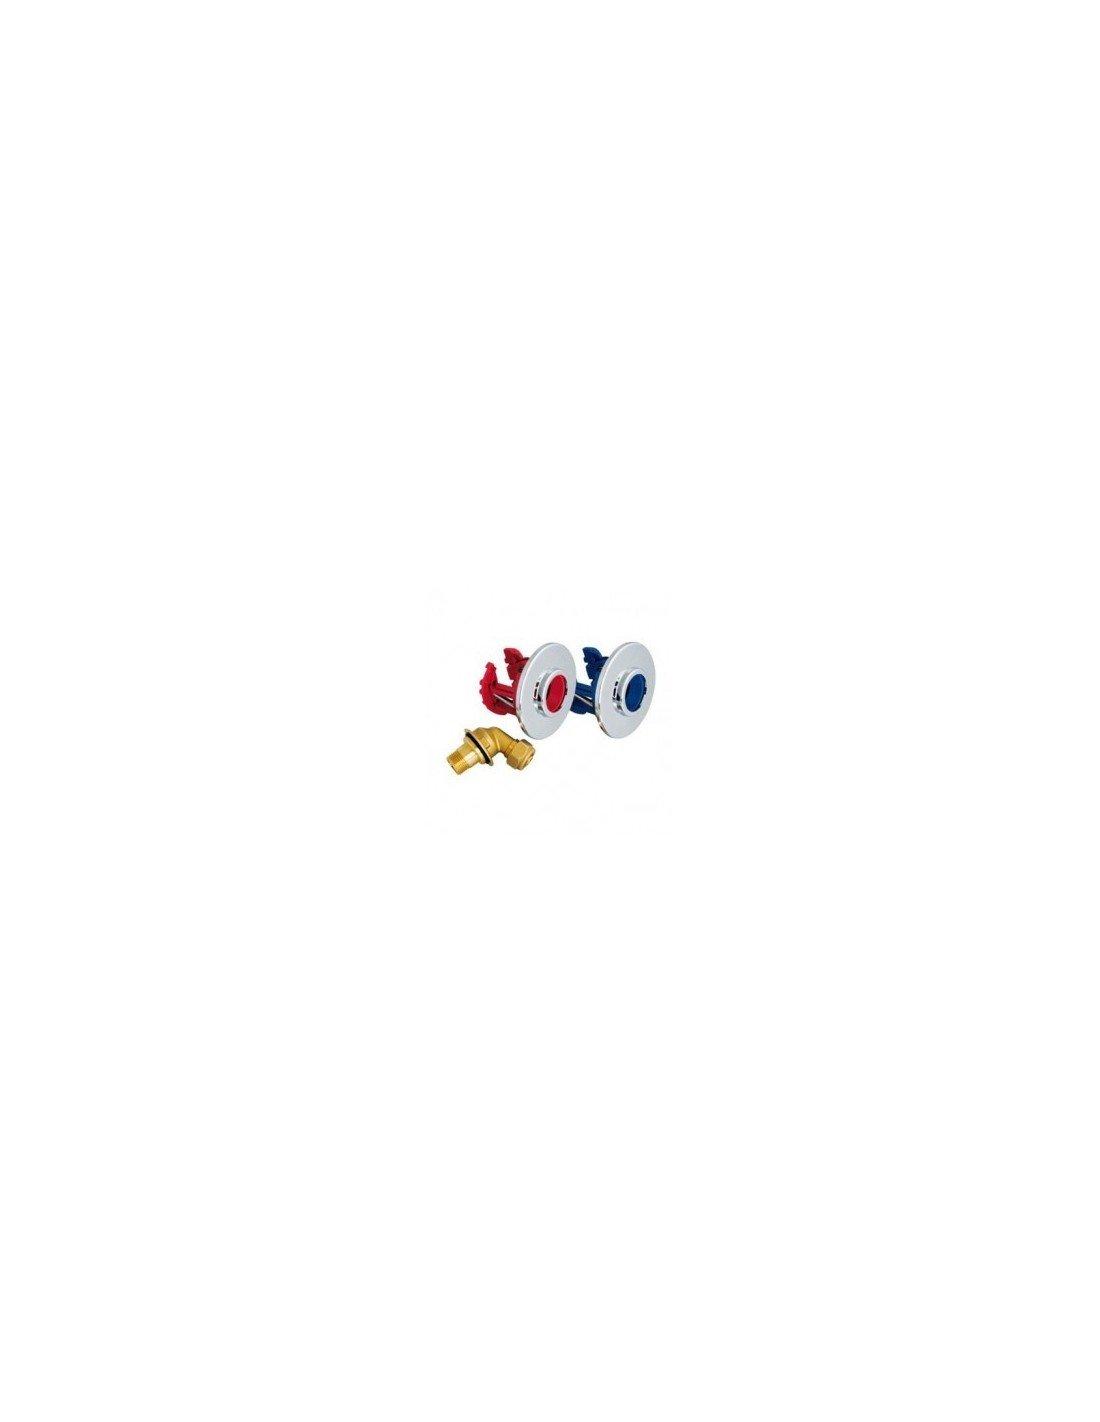 Somatherm KITD27-16-12 Fixoplac ss evier comp per13x16-m12//17 Gris